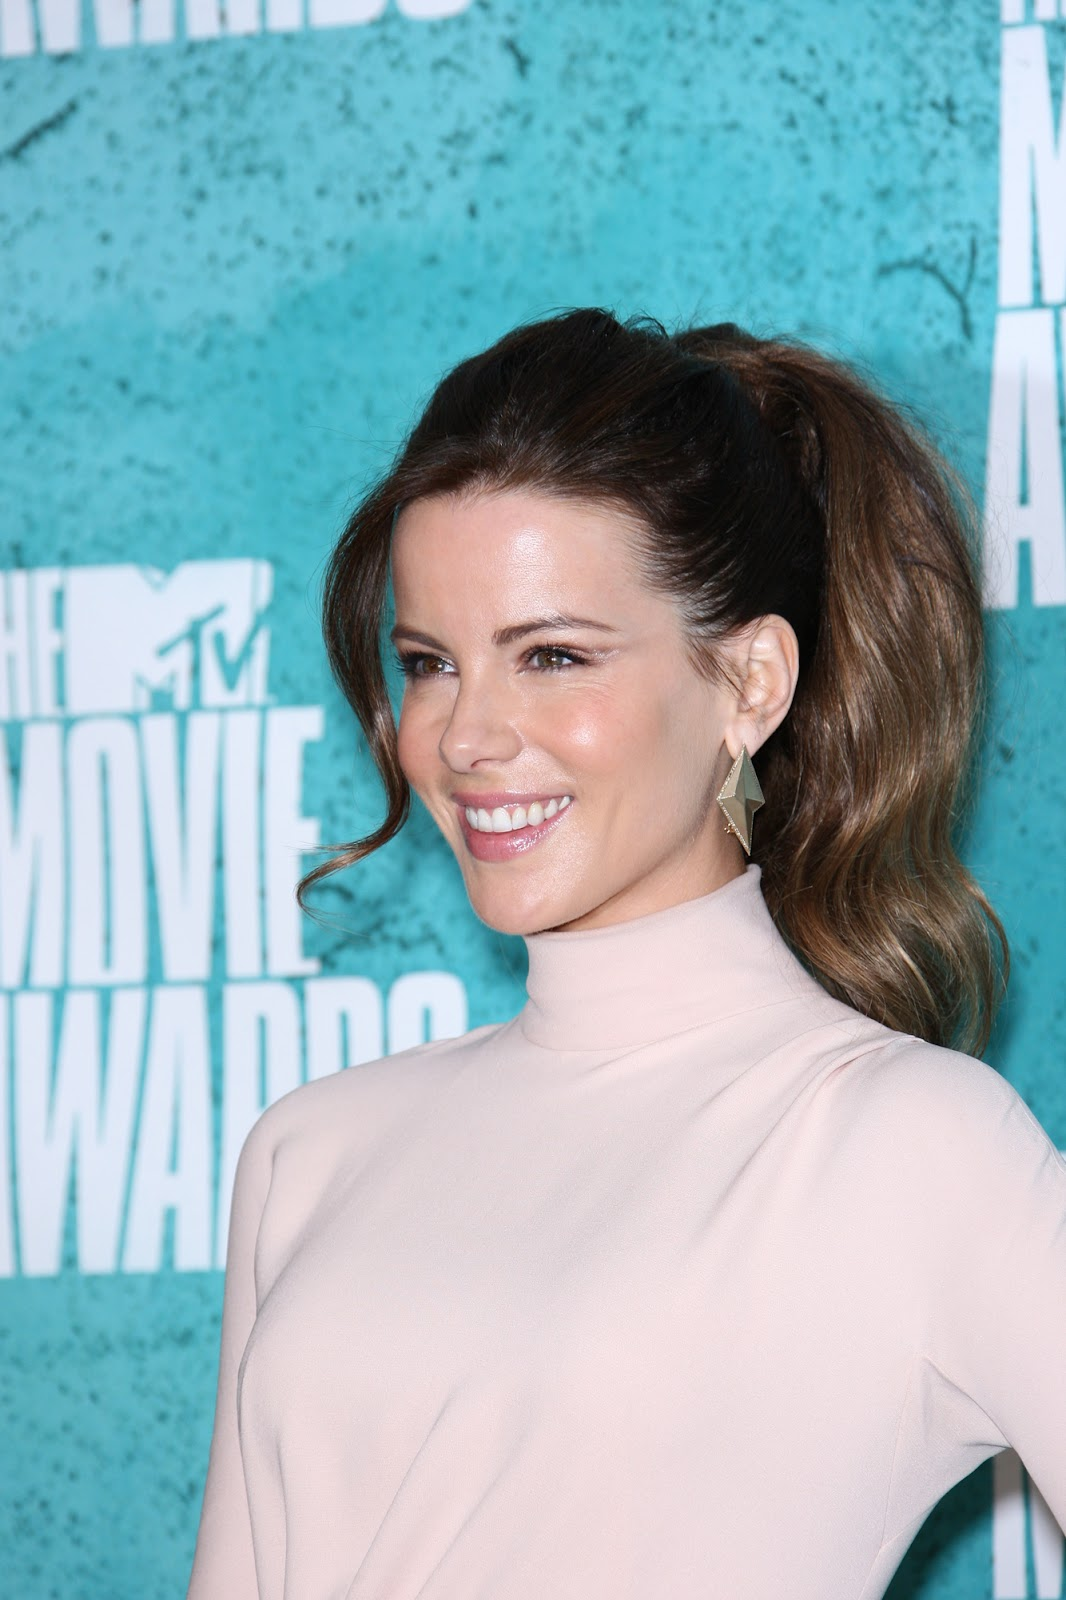 http://4.bp.blogspot.com/-PK0TkmeIqXk/T832fcxVEYI/AAAAAAAAtSI/w6Xrn4R0MVU/s1600/Kate_Beckinsale+-+MTV+Movie+Awards+2012+at+Universal+Studios%252C+June+3-007.jpg